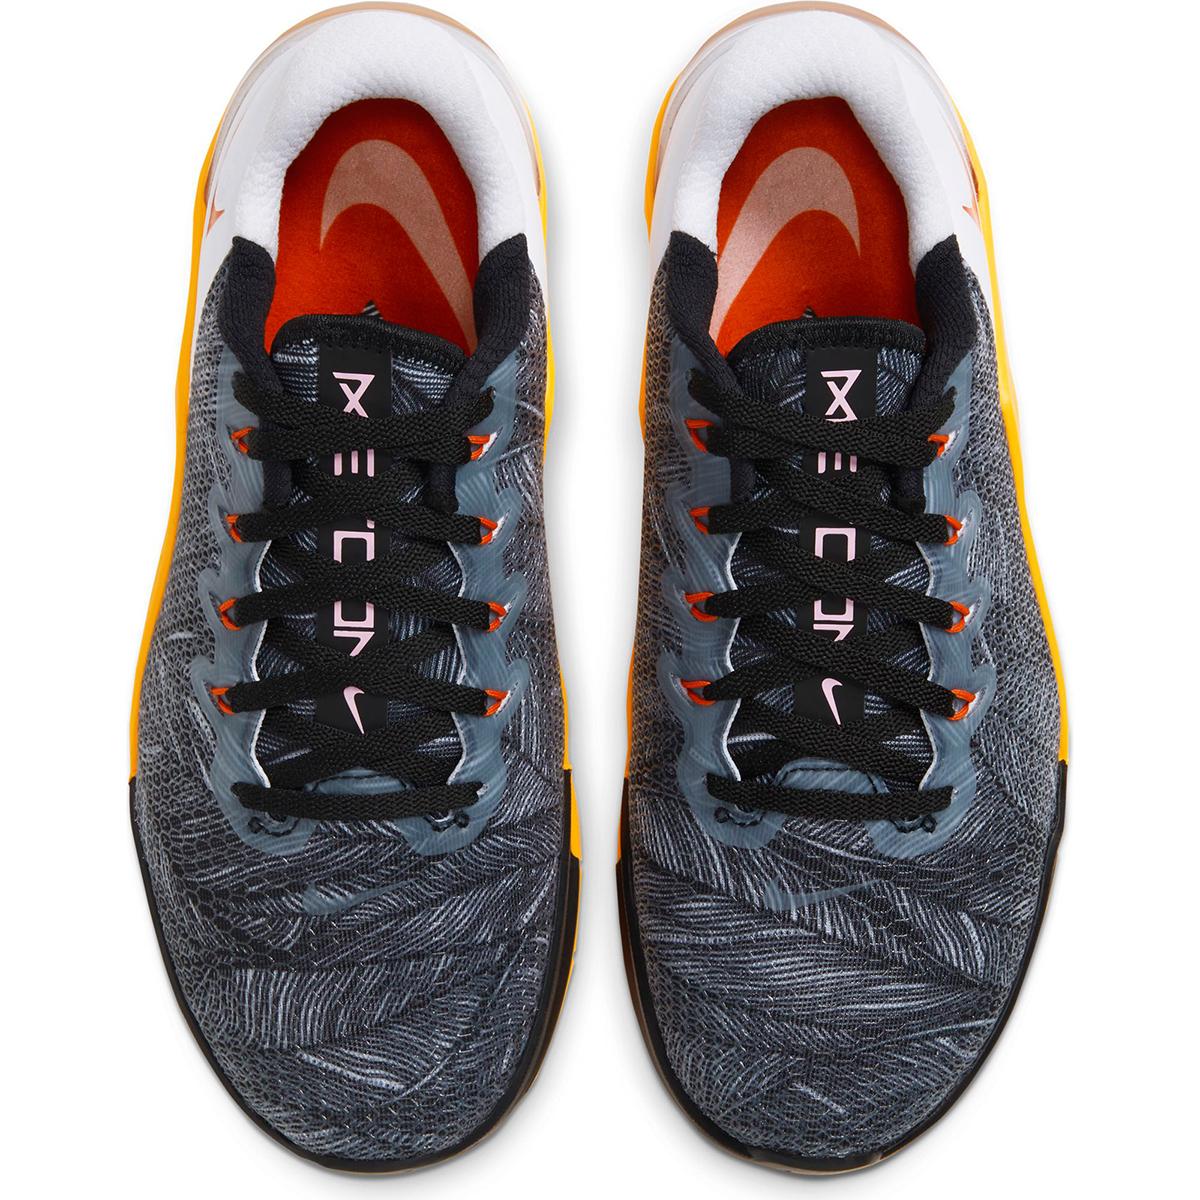 Women's Nike Metcon 5 Training Shoes - Color: Black/White/Laser Orange/Team Orange (Regular Width) - Size: 5, Black/White/Laser Orange/Team Orange, large, image 5